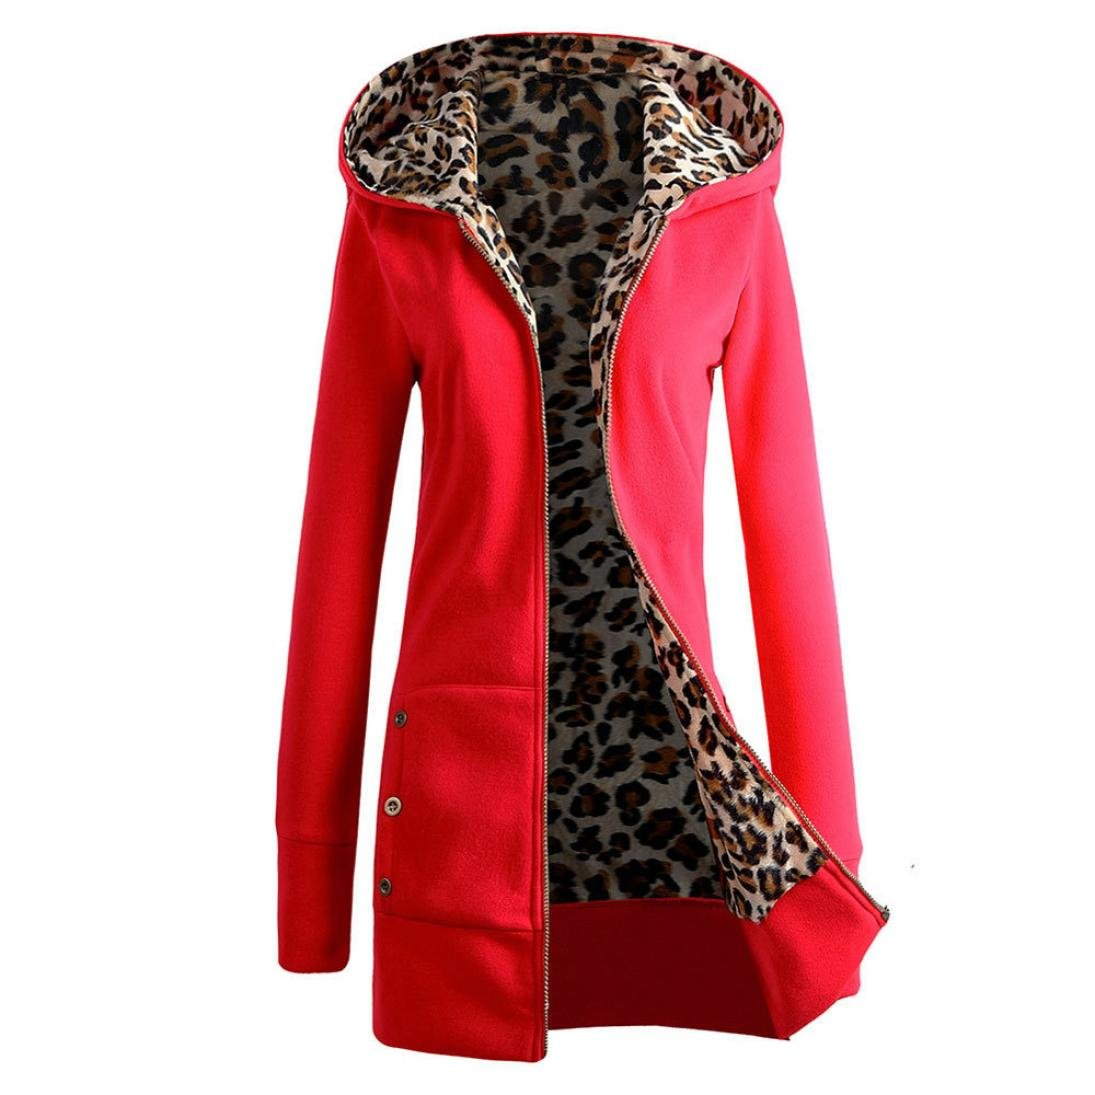 DaySeventh Women Velvet Zipper Hooded Sweater Leopard Pattern Coat DaySeventh-123